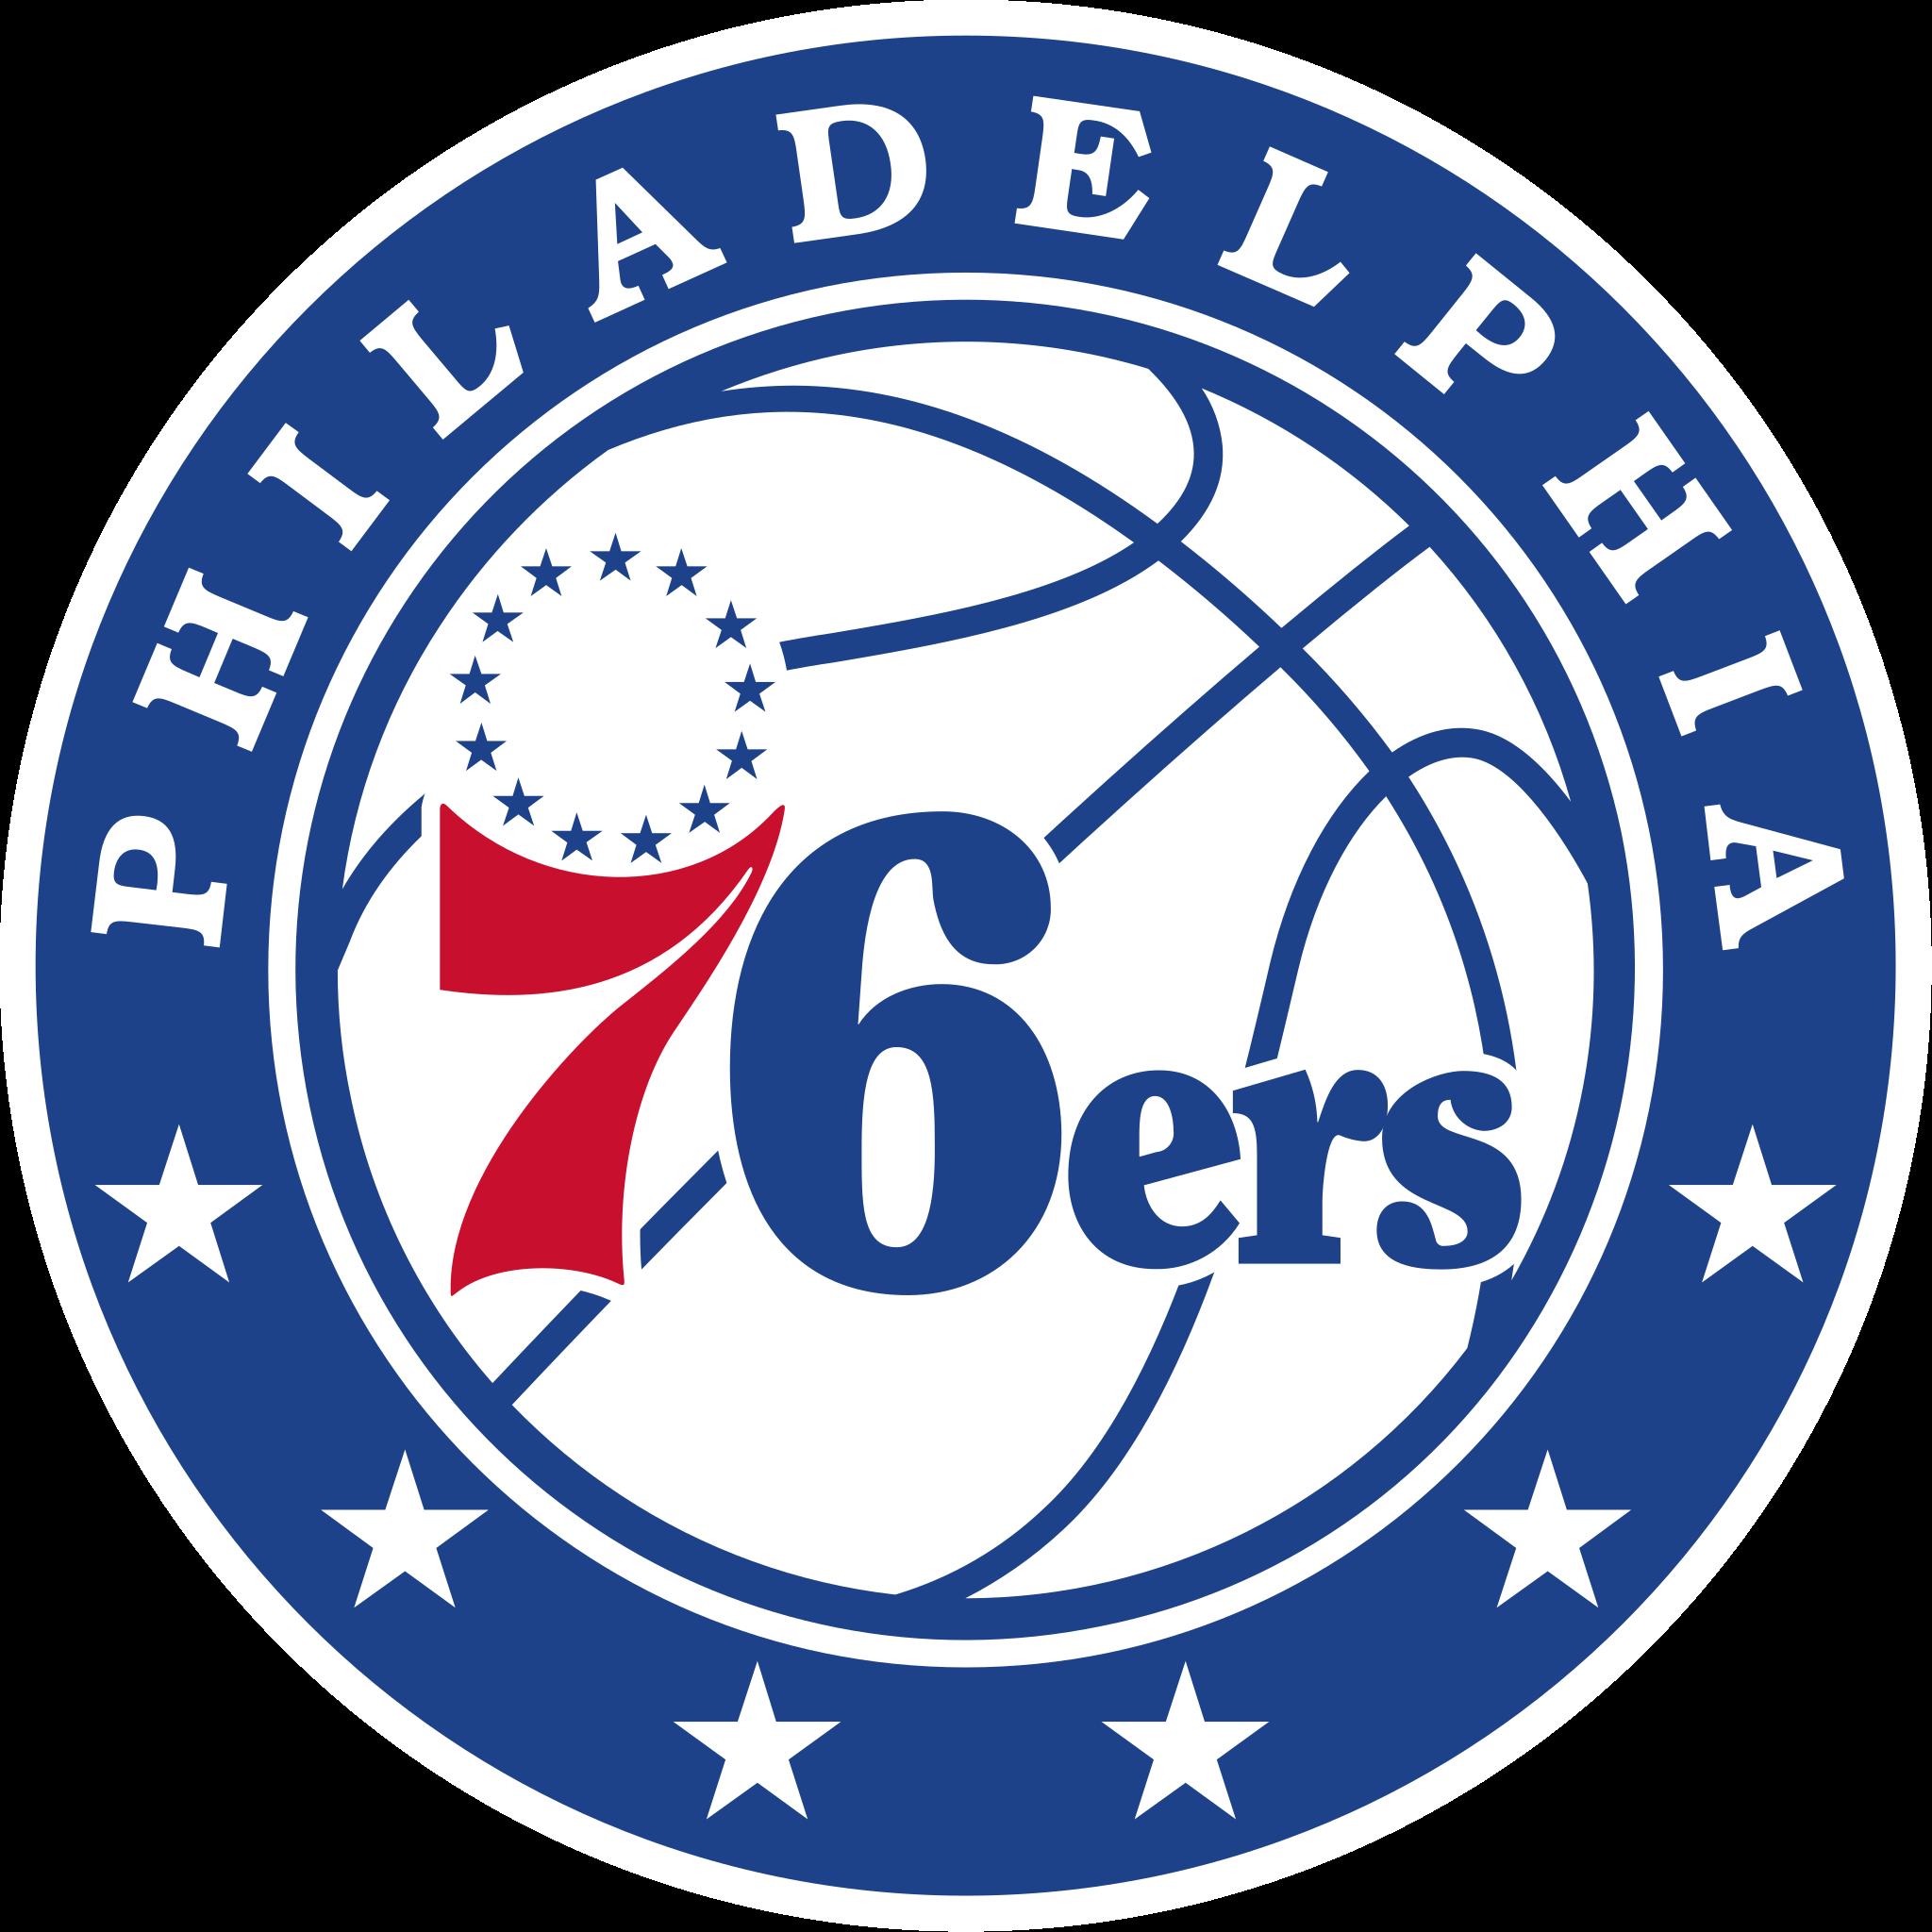 Philadelphia76erslogo